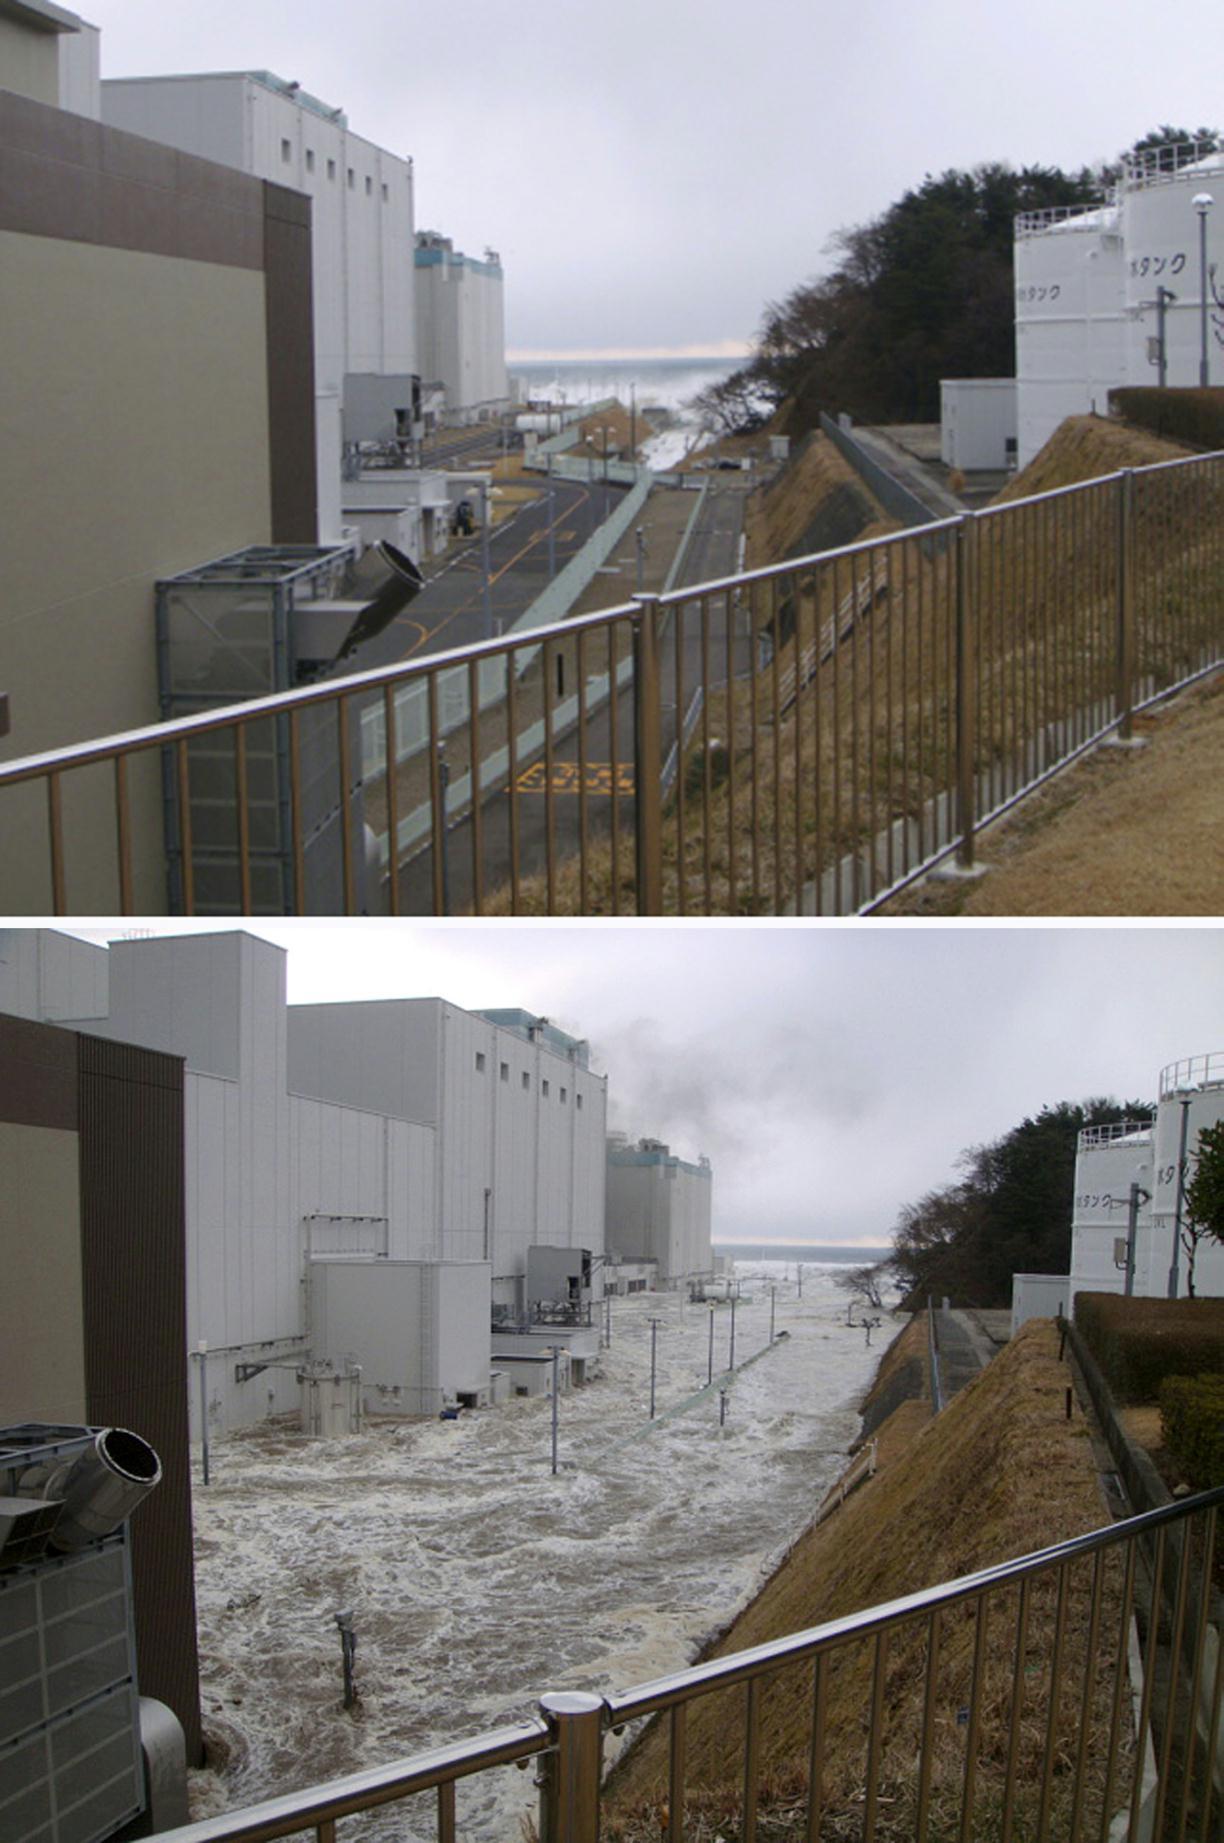 1 water rushing into the Fukushima nuclear reactor during the March 11 tsunami b.jpg